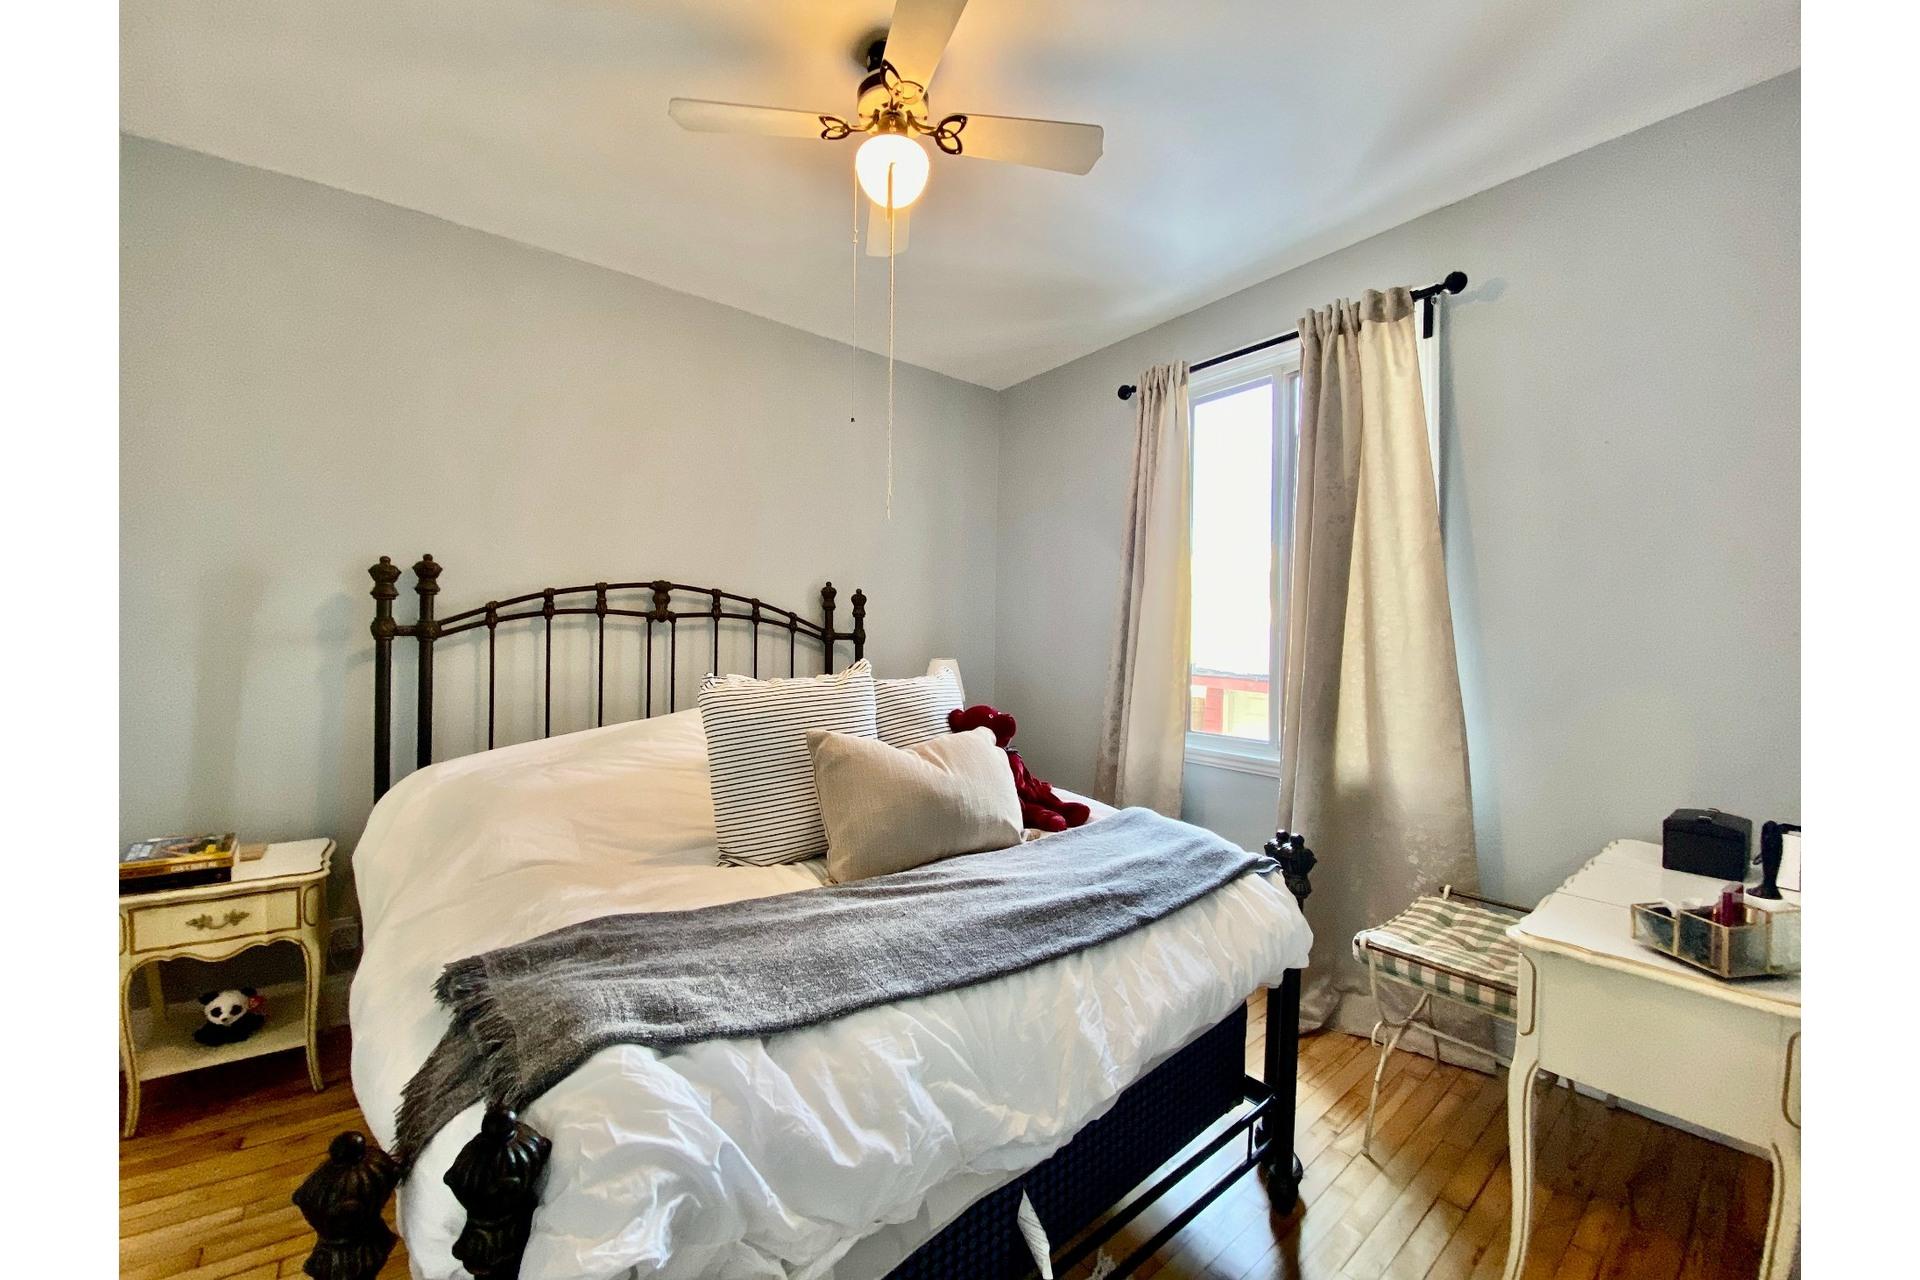 image 10 - Duplex En venta Lachine Montréal  - 6 habitaciones